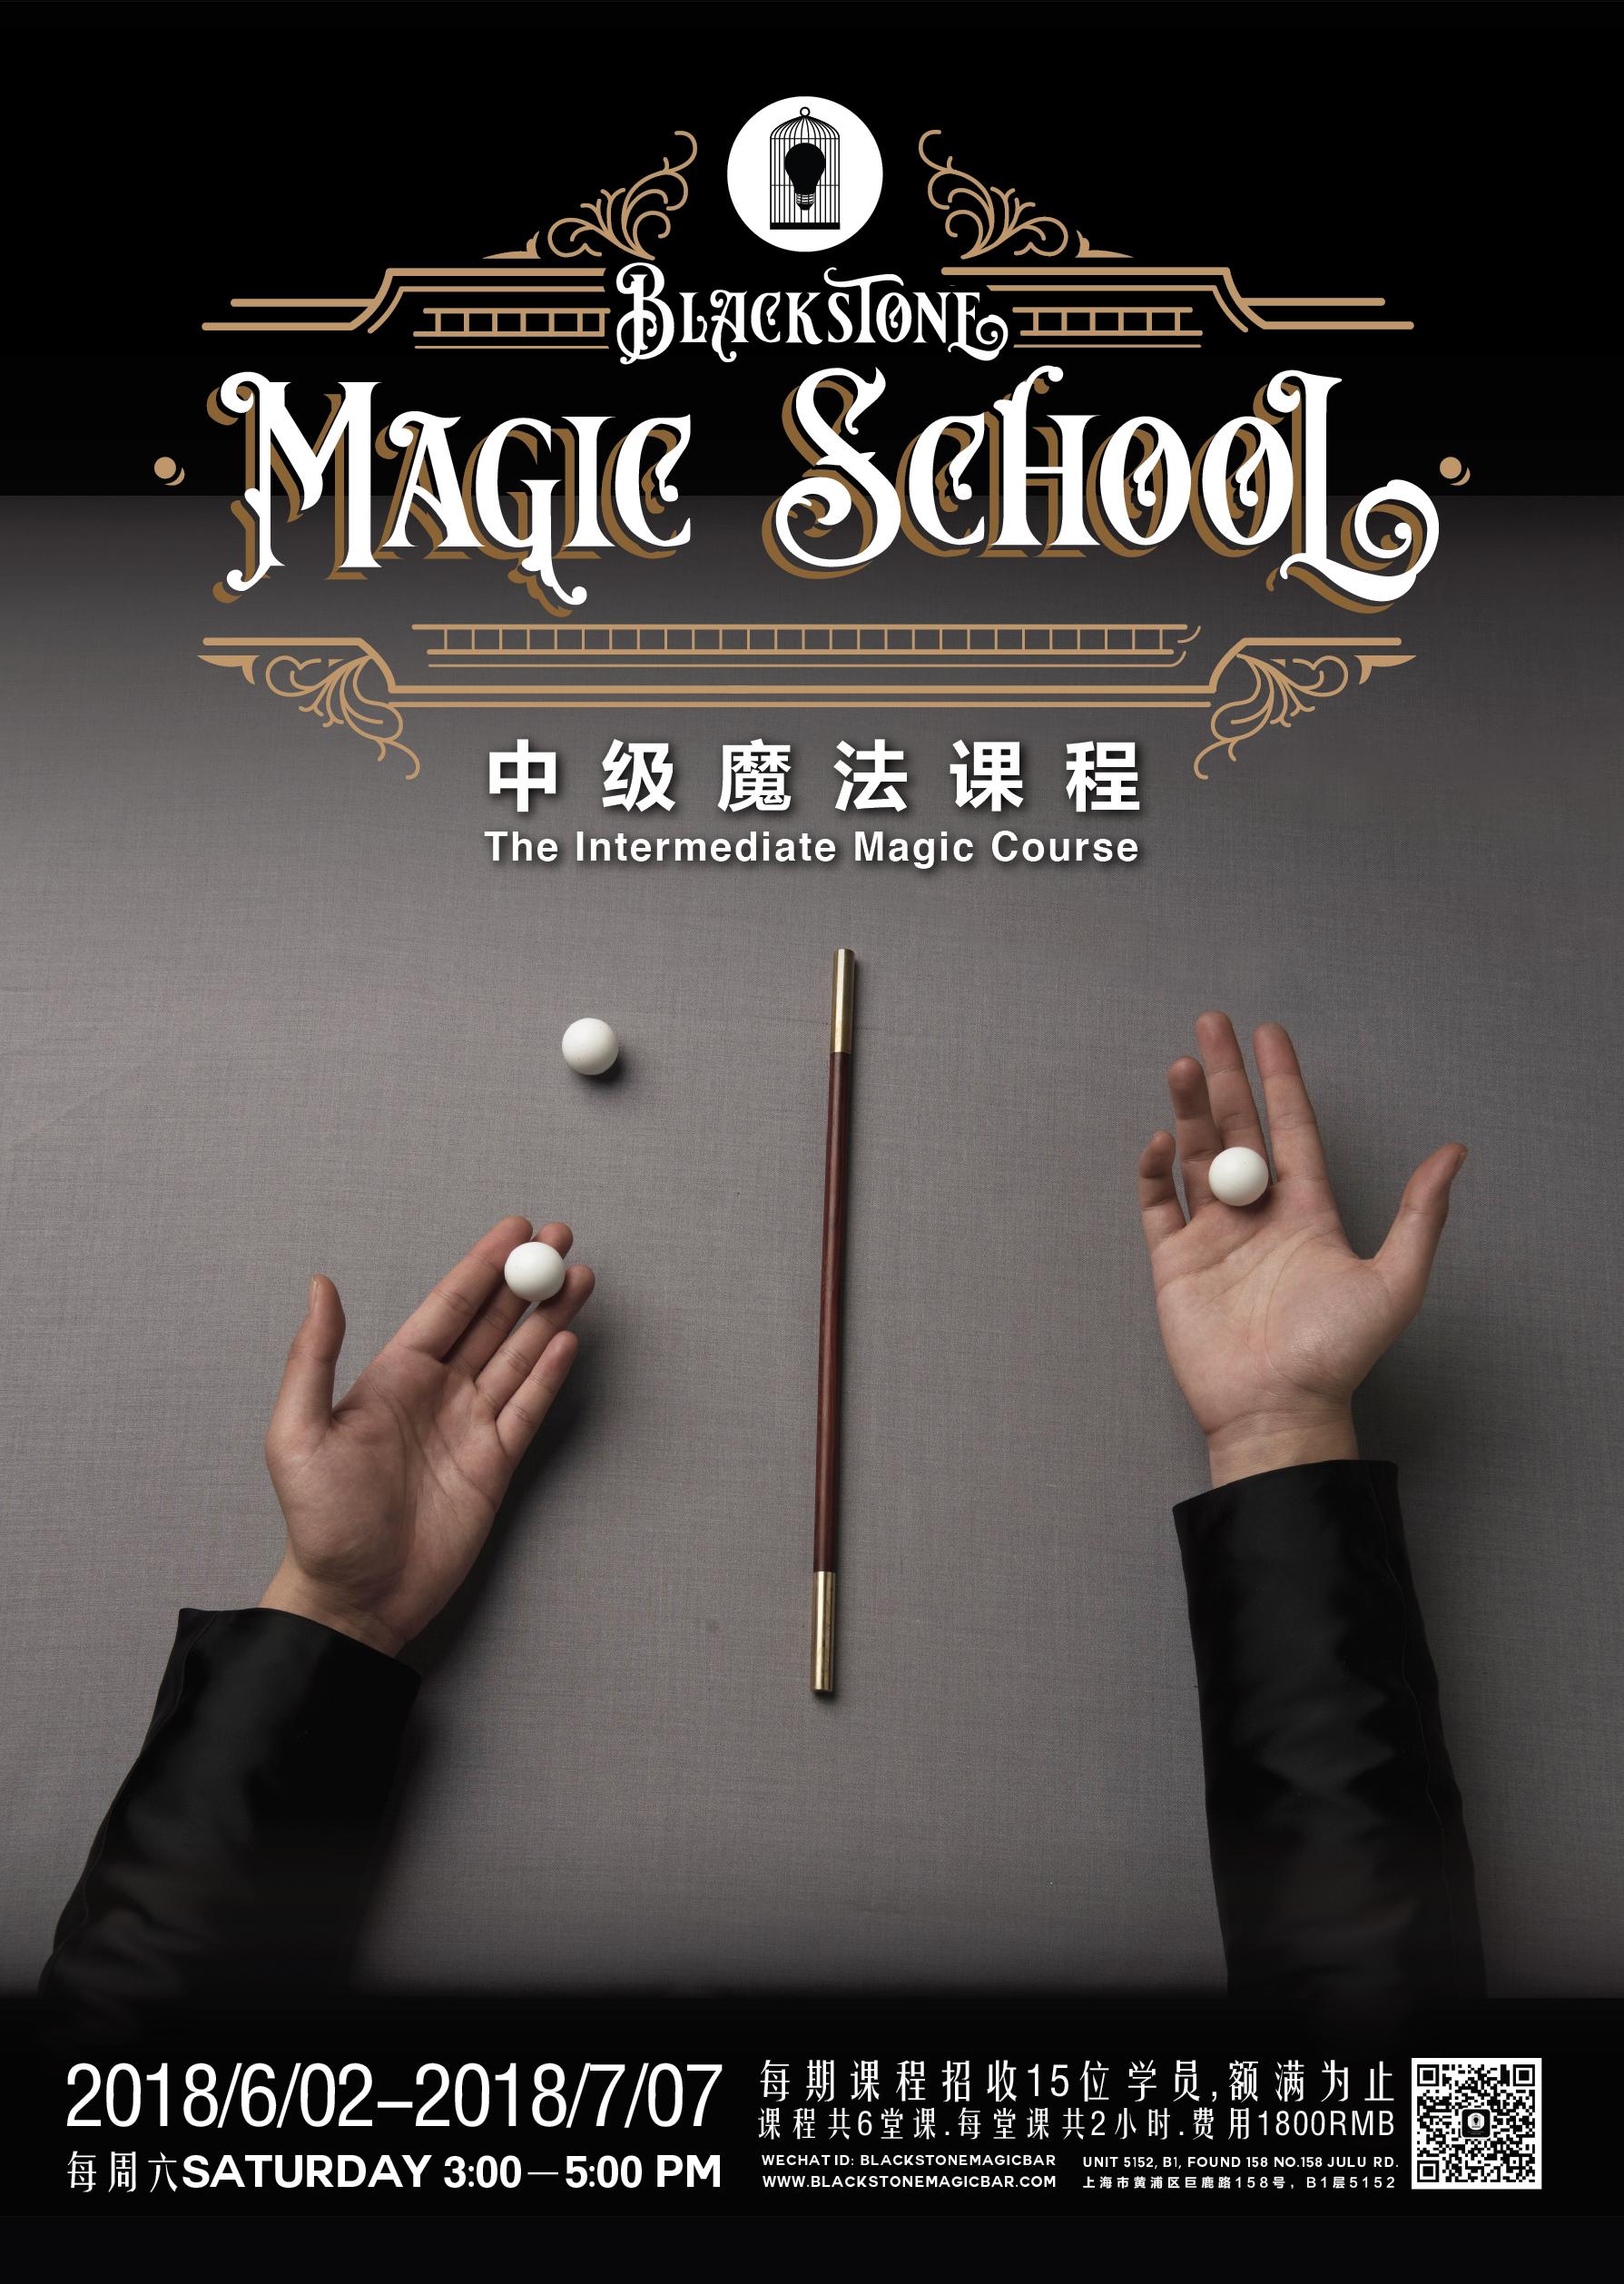 Blackstone Magic School - 中级课程